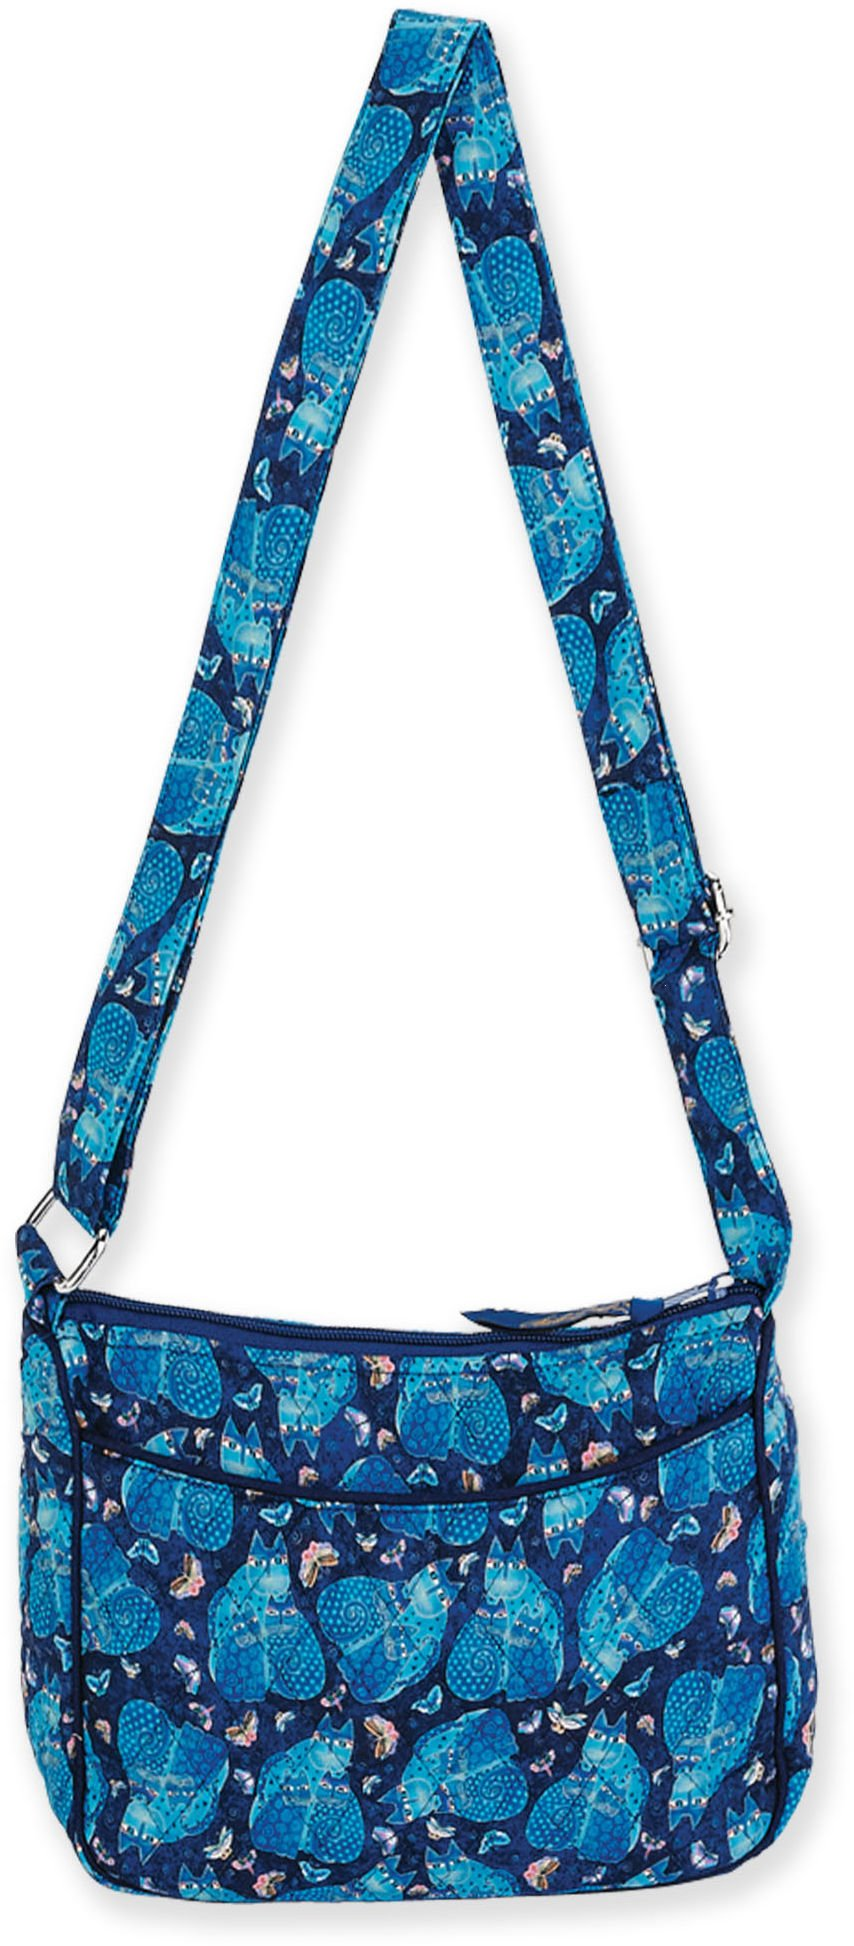 Laurel Burch Quilted Cotton E/W Crossbody Bag (Indigo Cats)